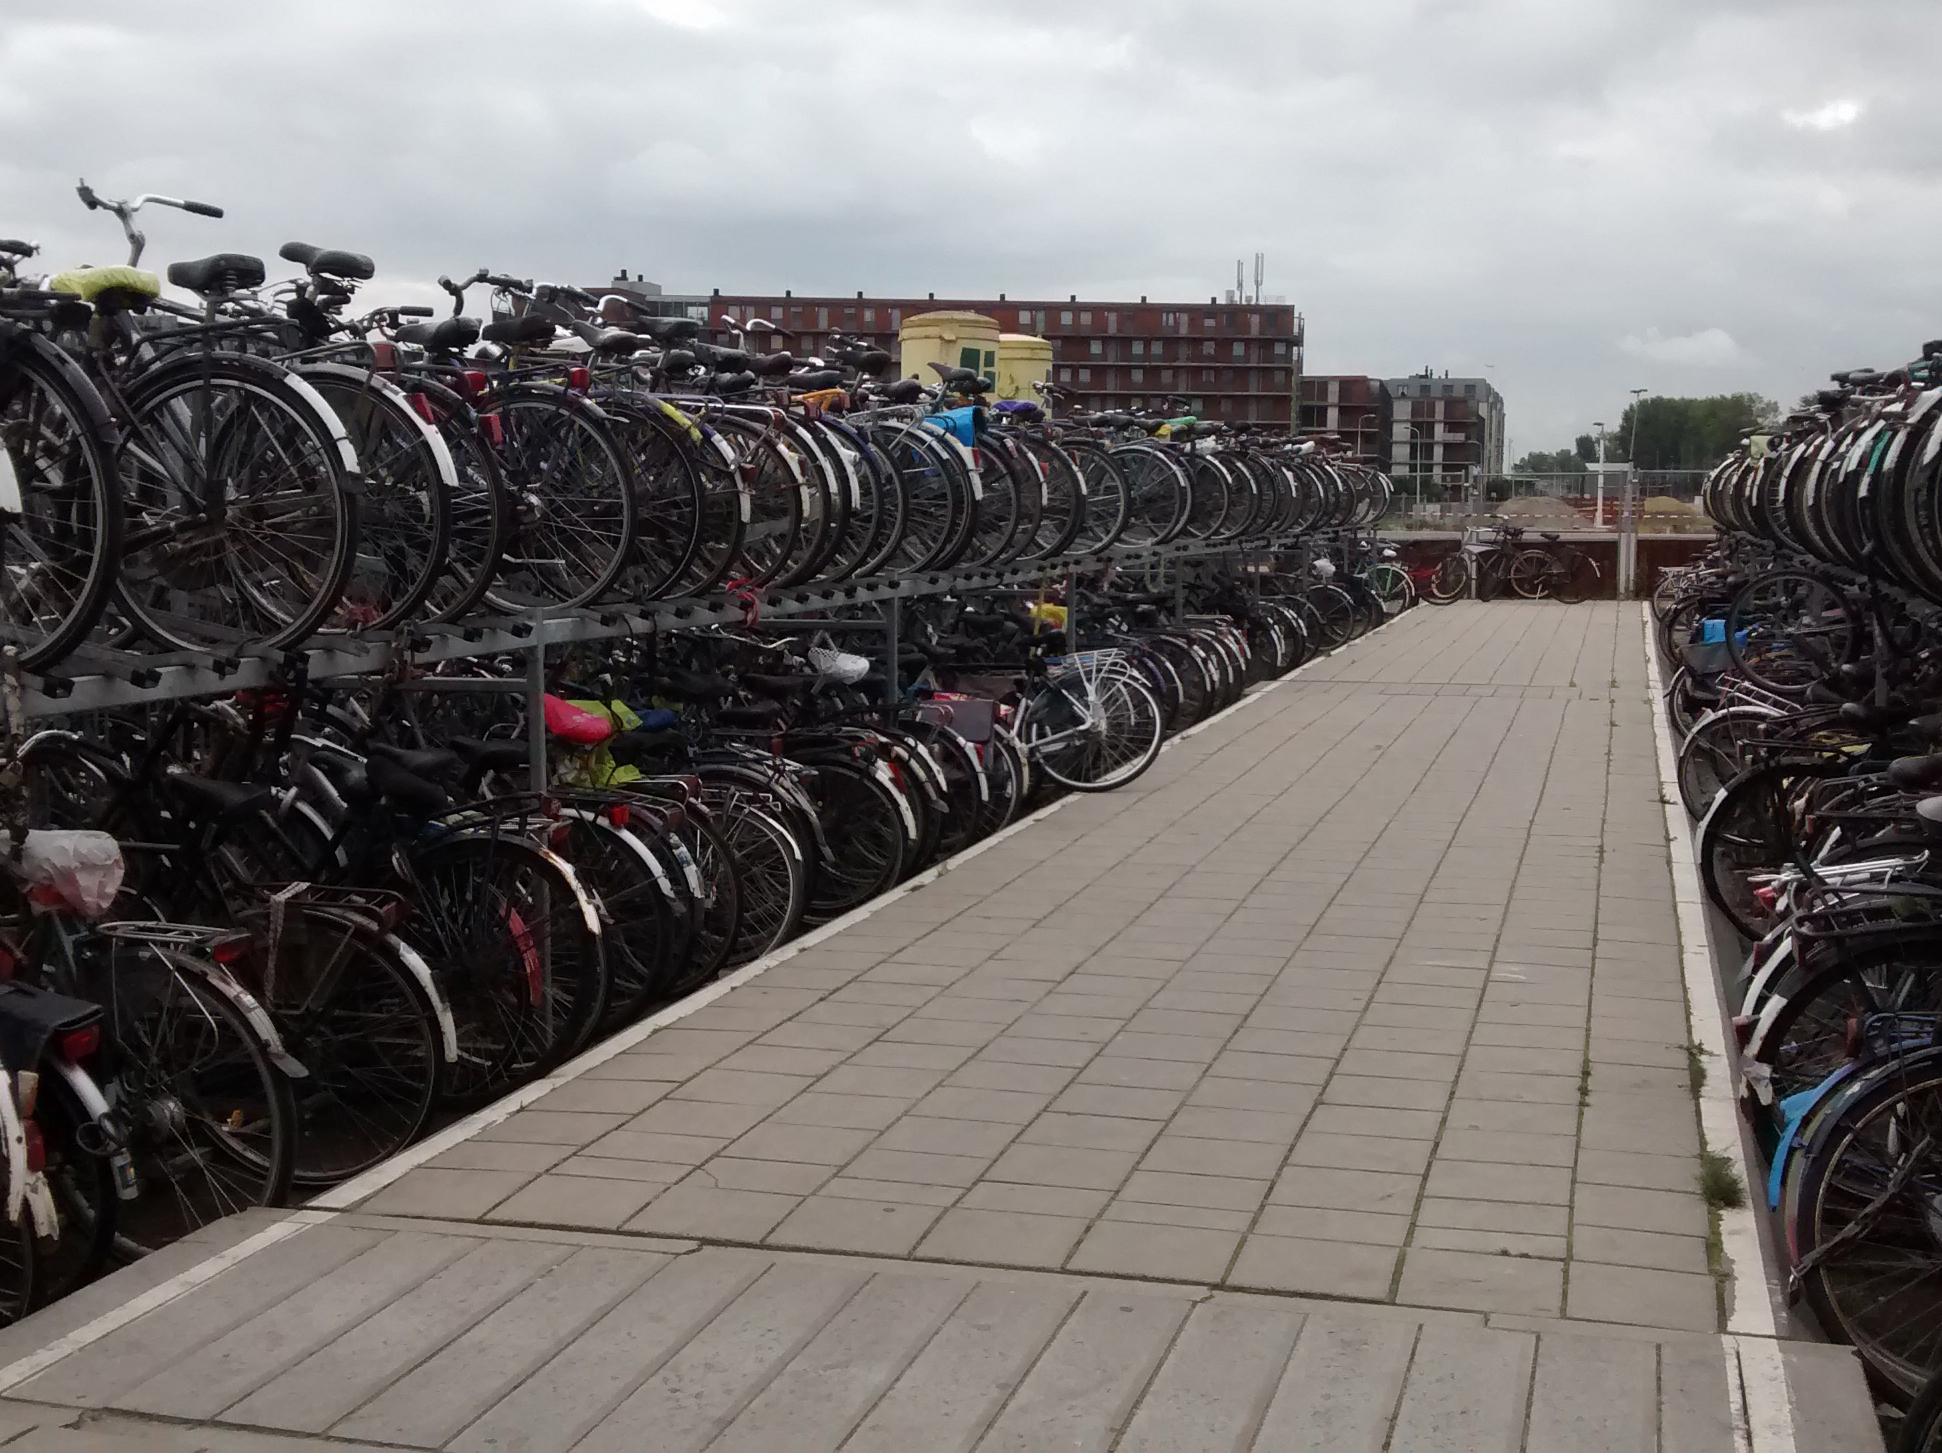 bike-parking-Delft.jpg